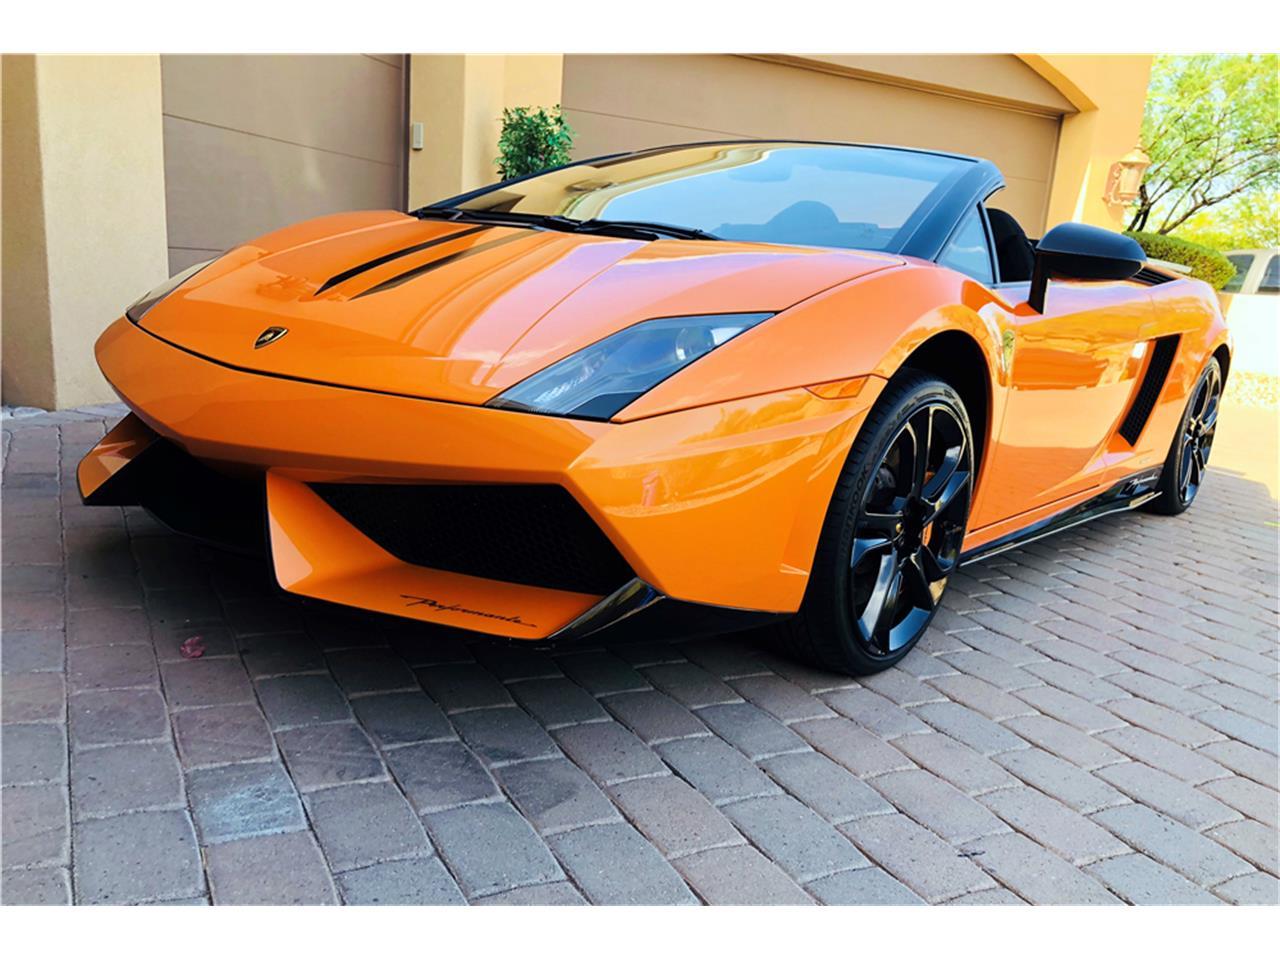 2013 Lamborghini Gallardo For Sale Classiccars Com Cc 1143728